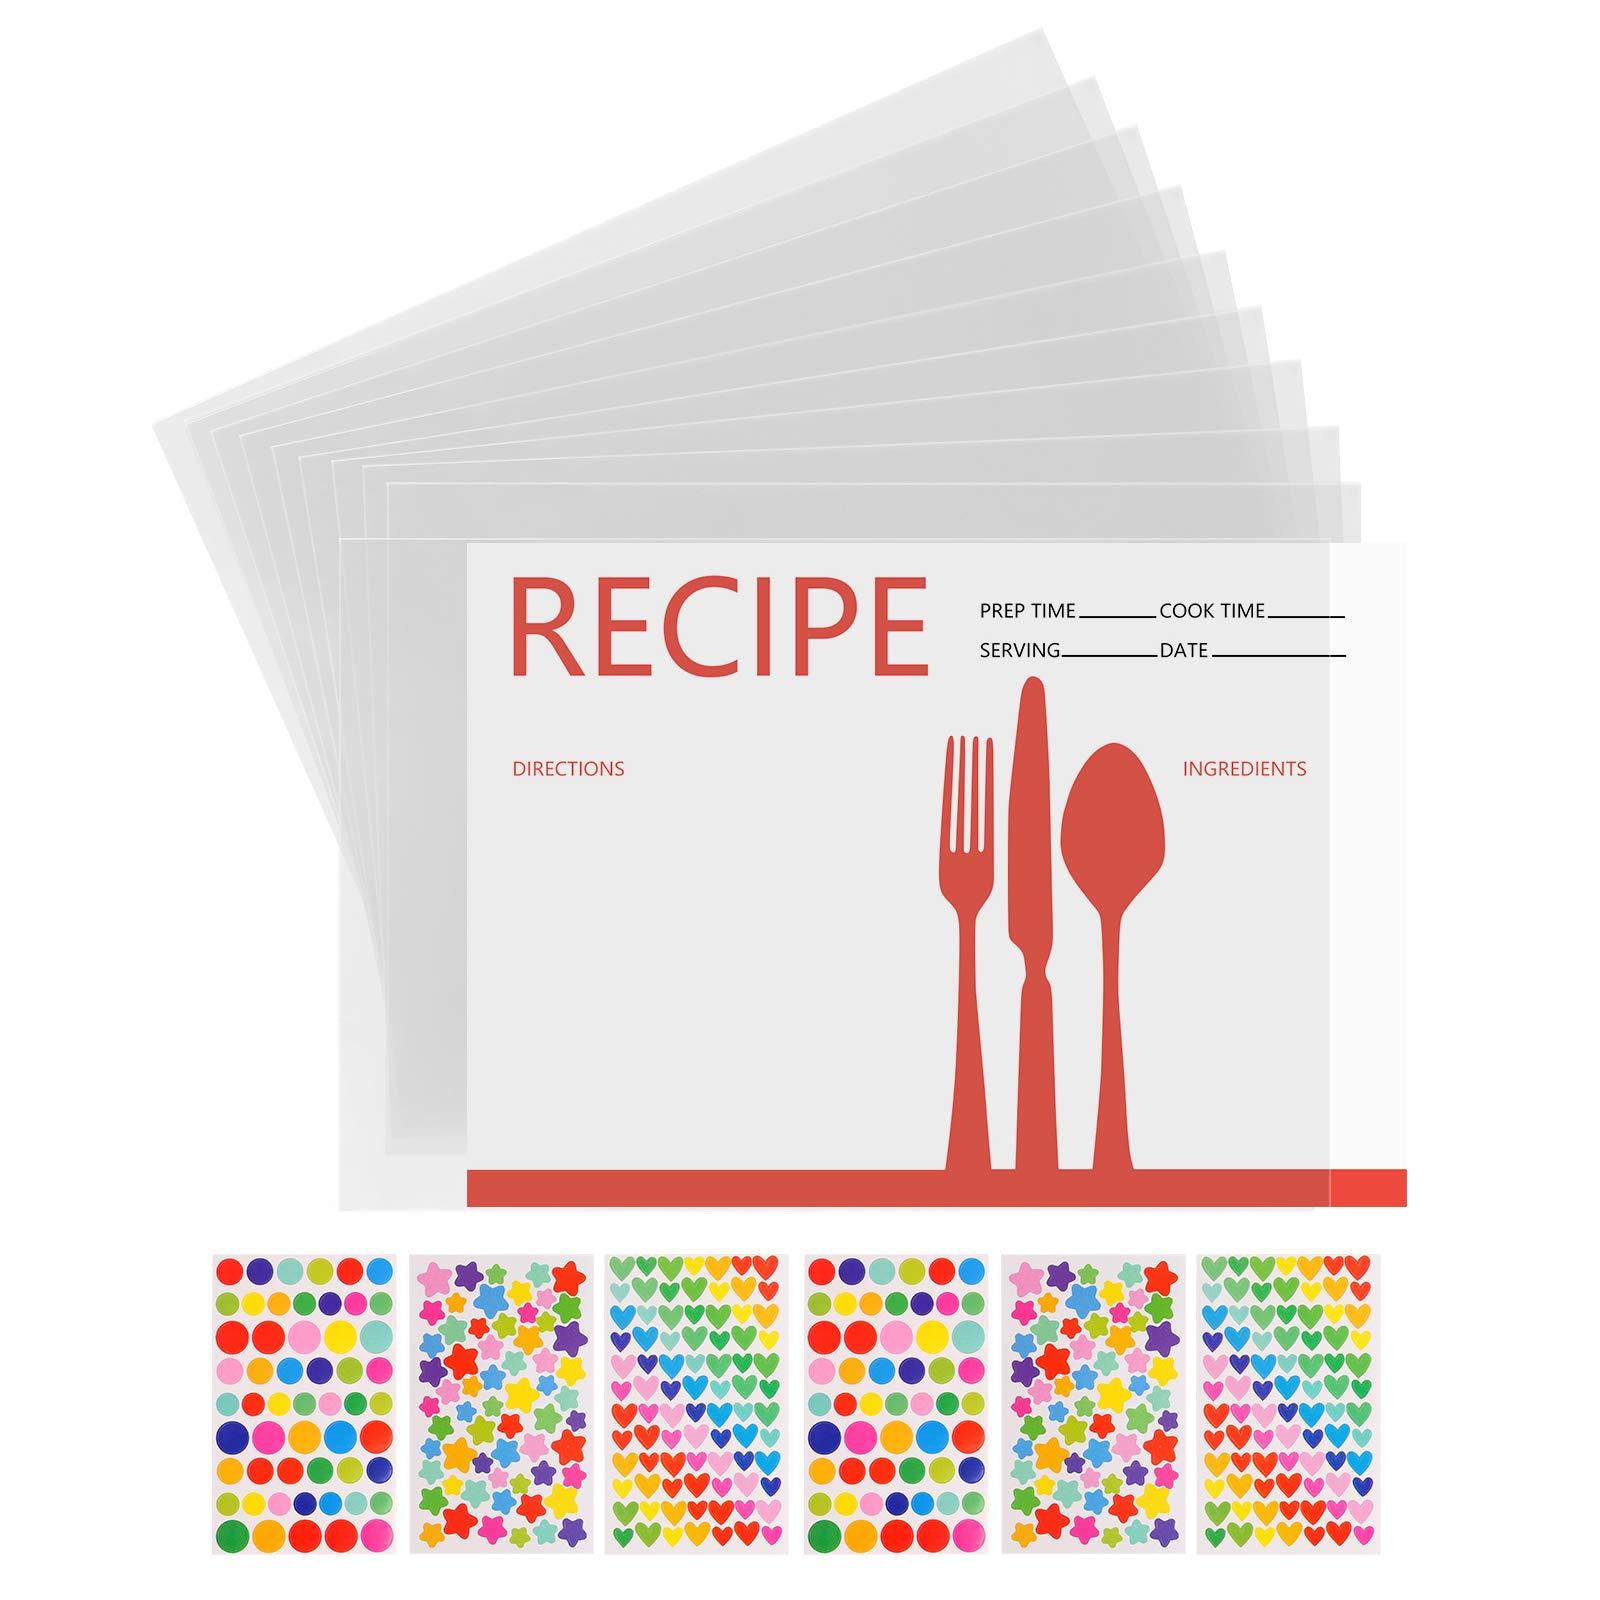 ozozo Recipe Card Protectors 4x6-100 Pack 4x6 Recipe Card Protectors, Recipe Card Covers,Plastic Sleeves for 4x6 Recipe Card